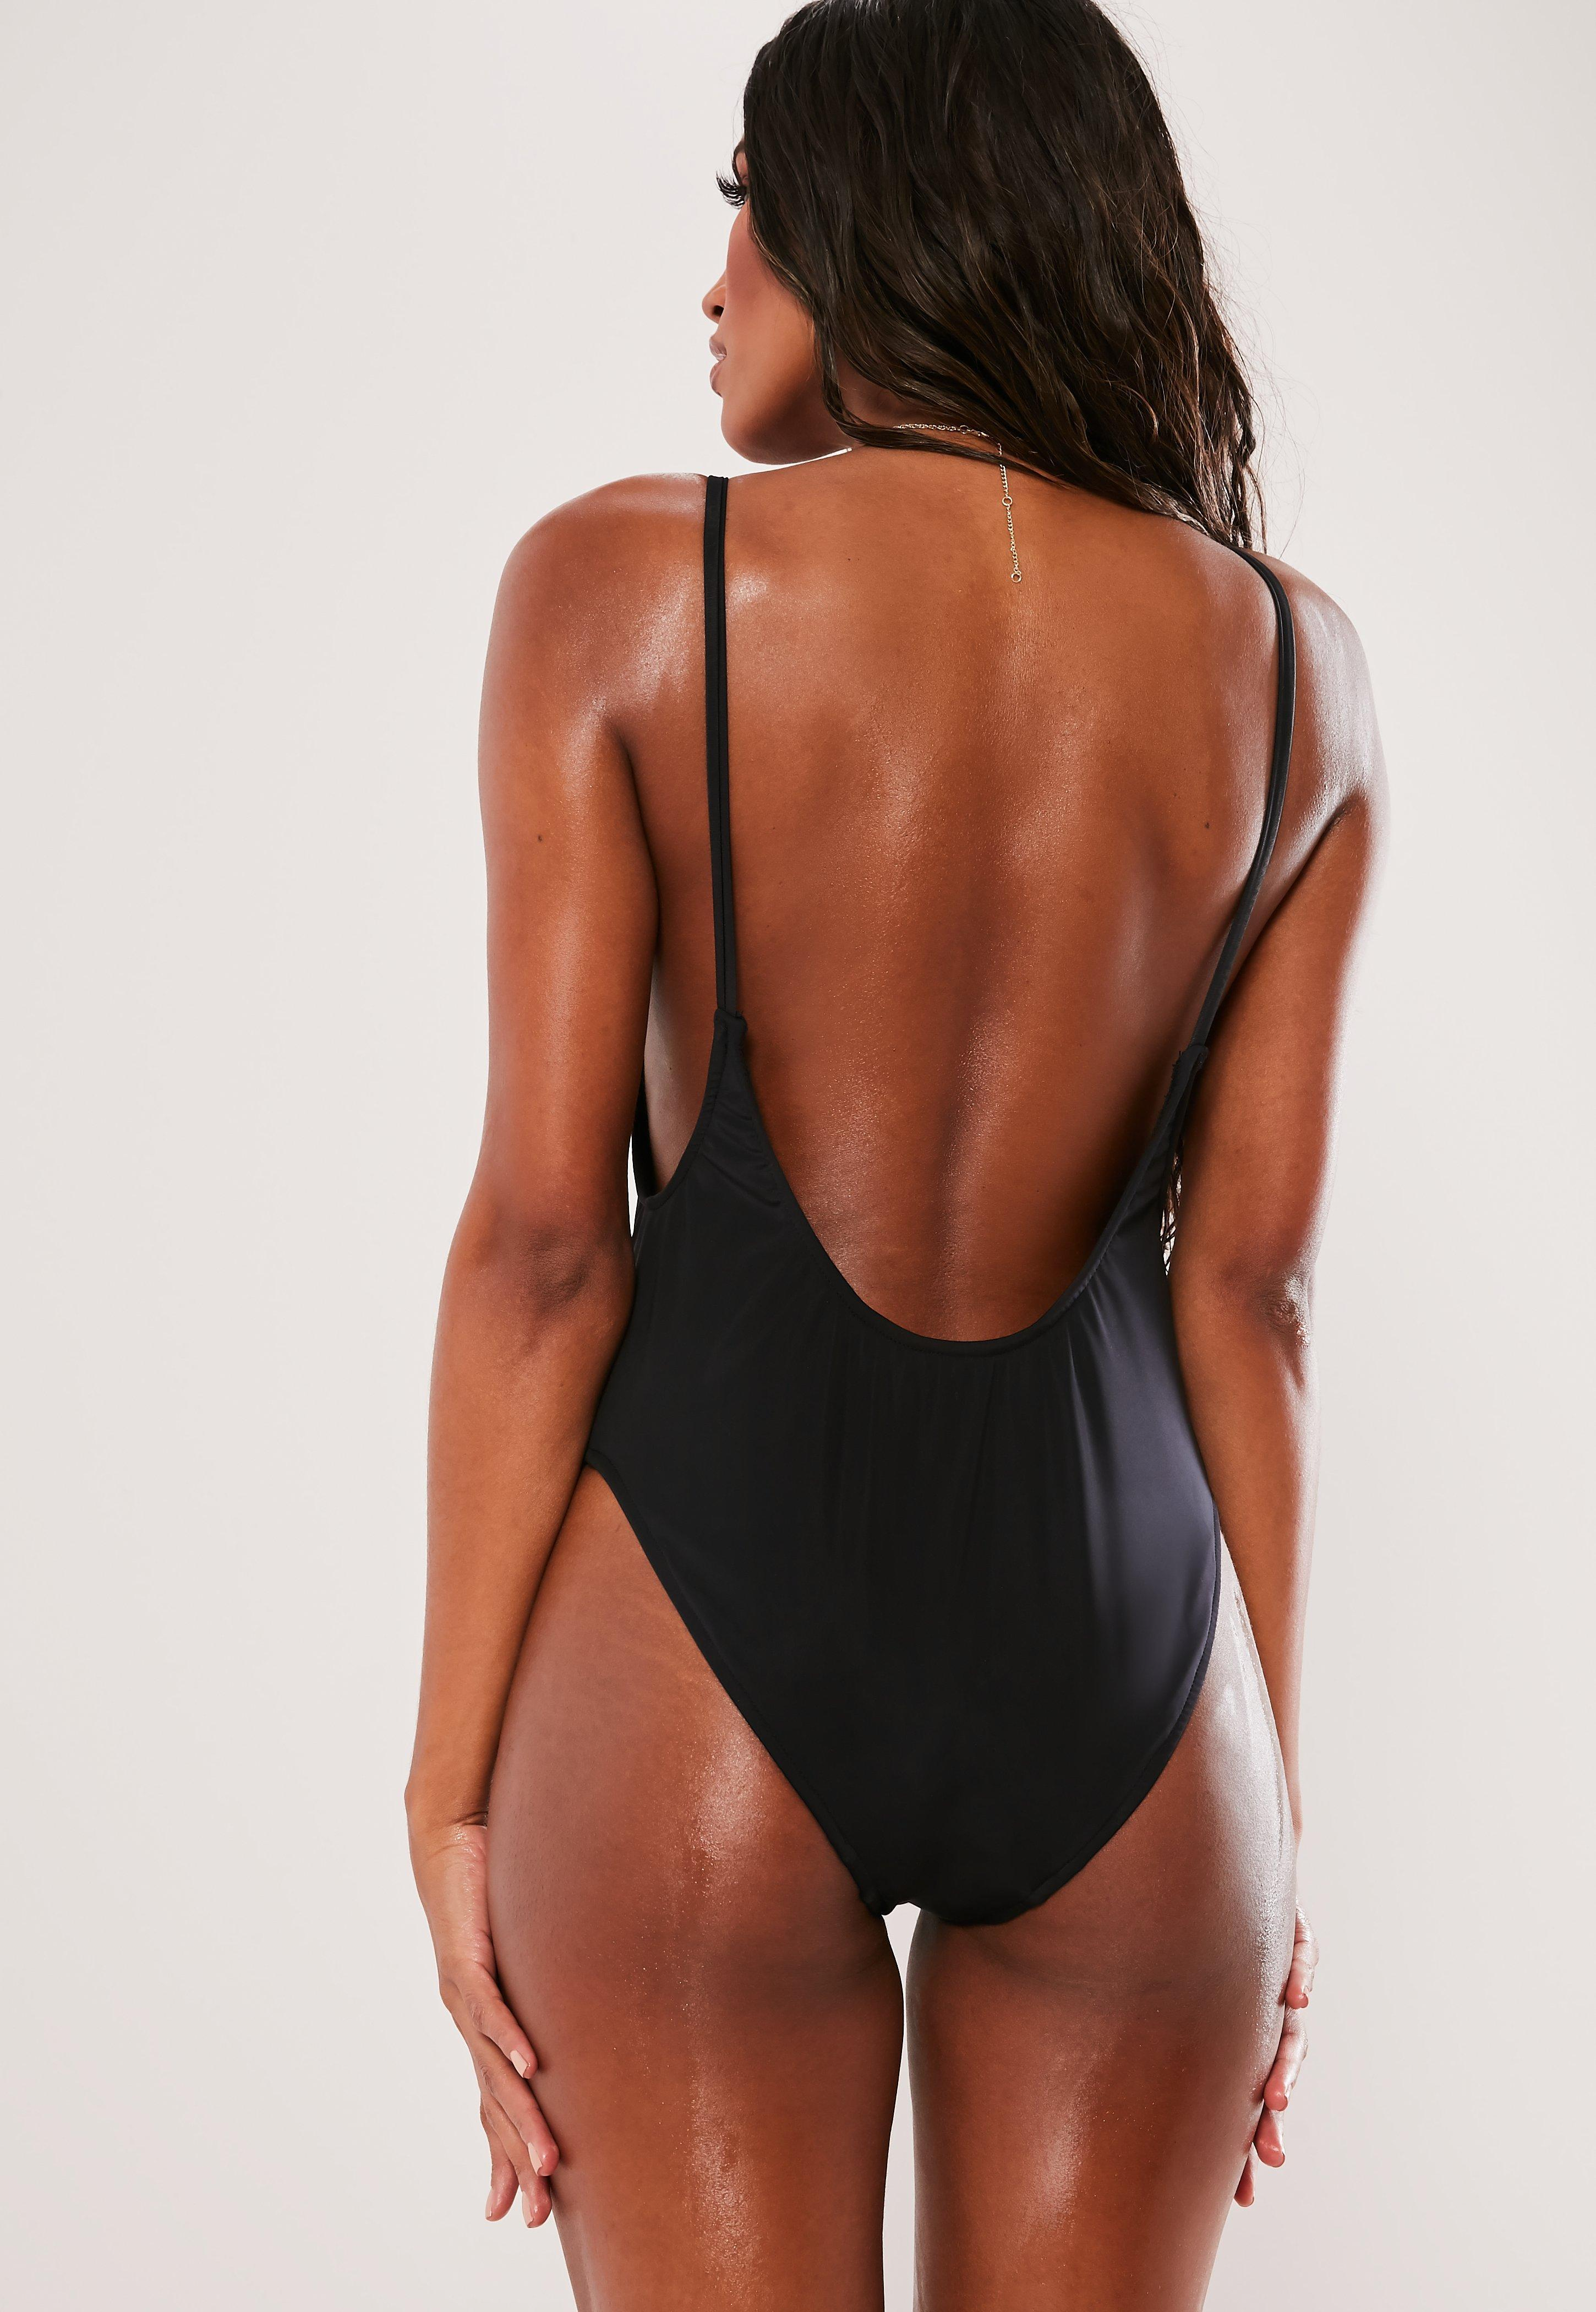 d3488e8e5866a Missguided - Black Scoop High Leg Swimsuit - Lyst. View fullscreen